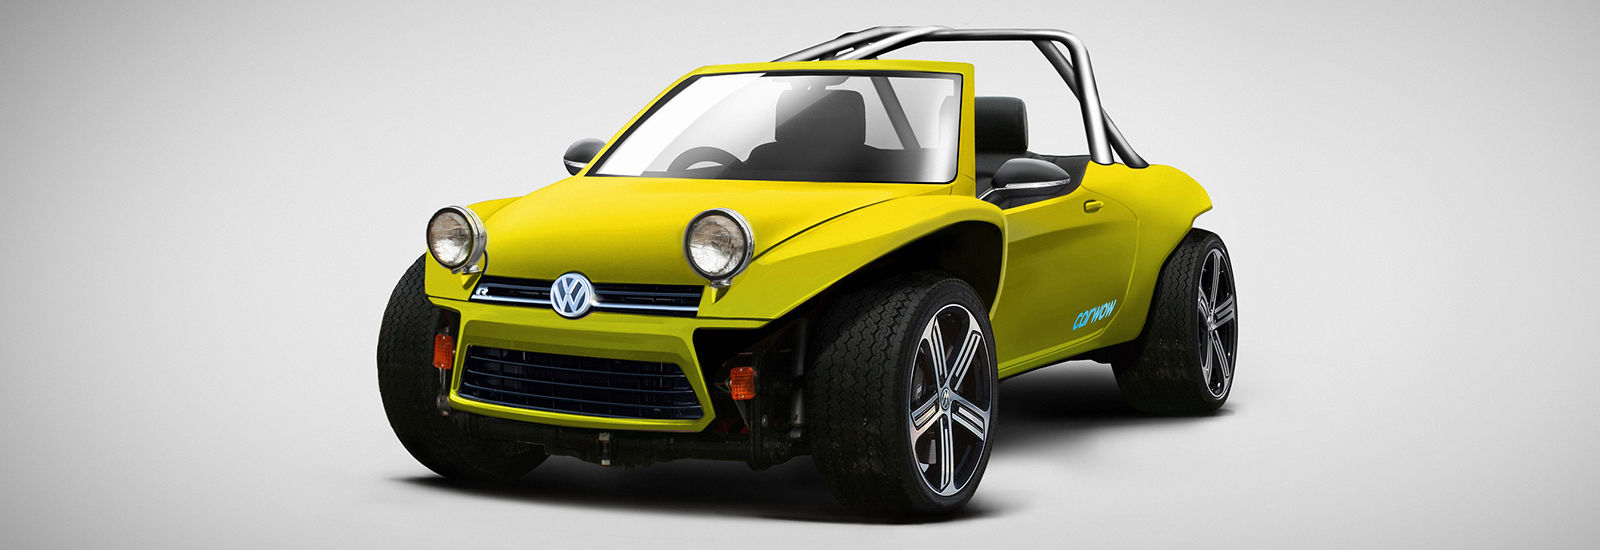 VW_Golf_Buggy